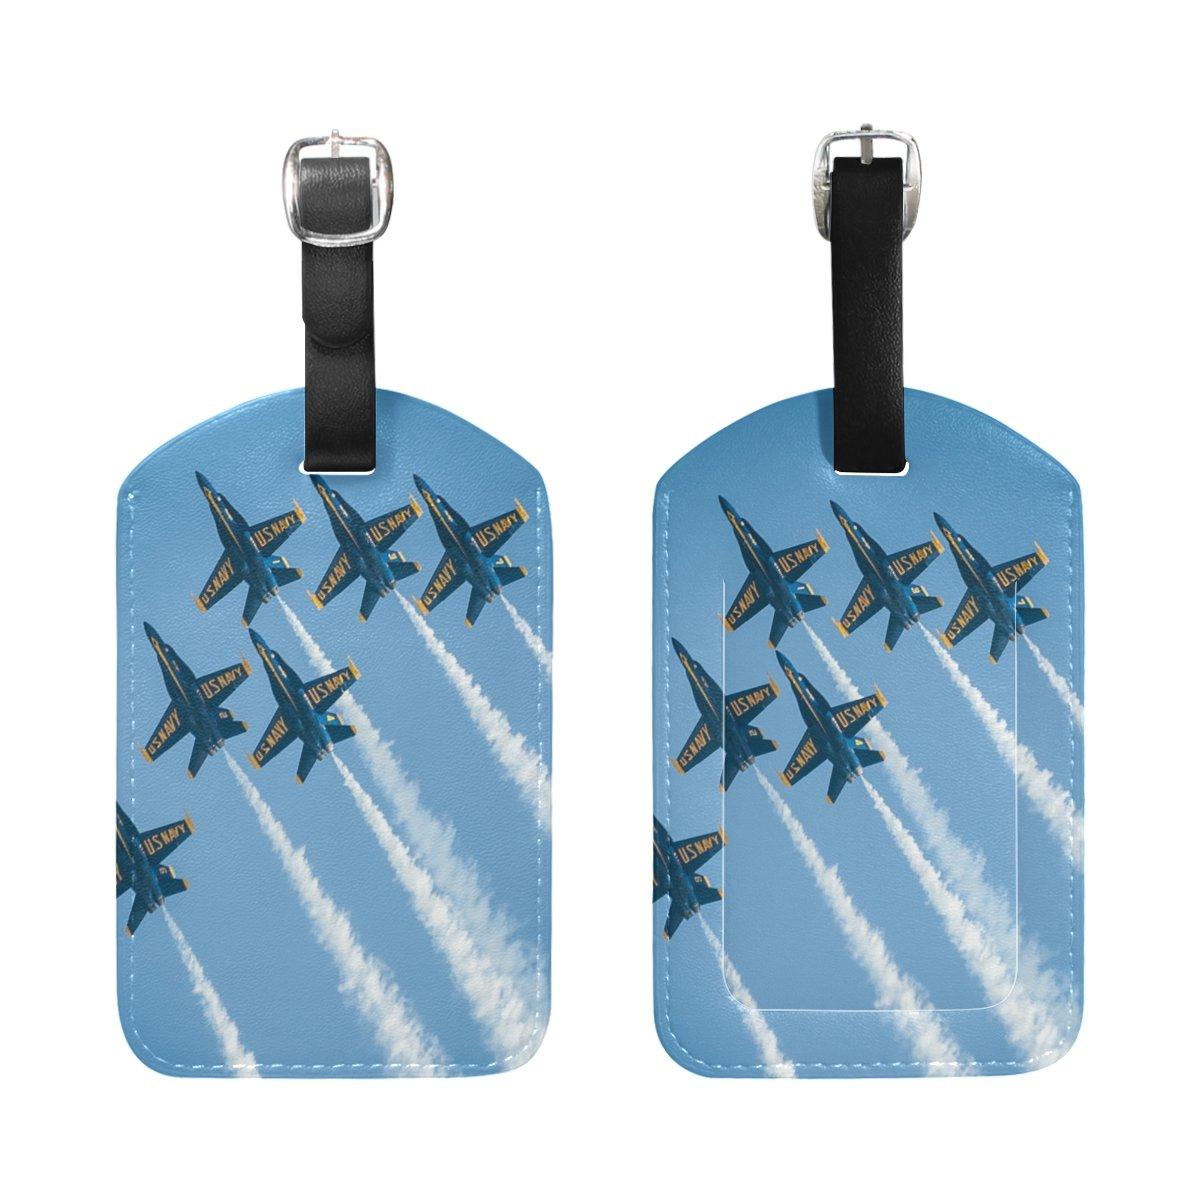 1Pcs Saobao Travel Luggage Tag Jet Plane PU Leather Baggage Suitcase Travel ID Bag Tag